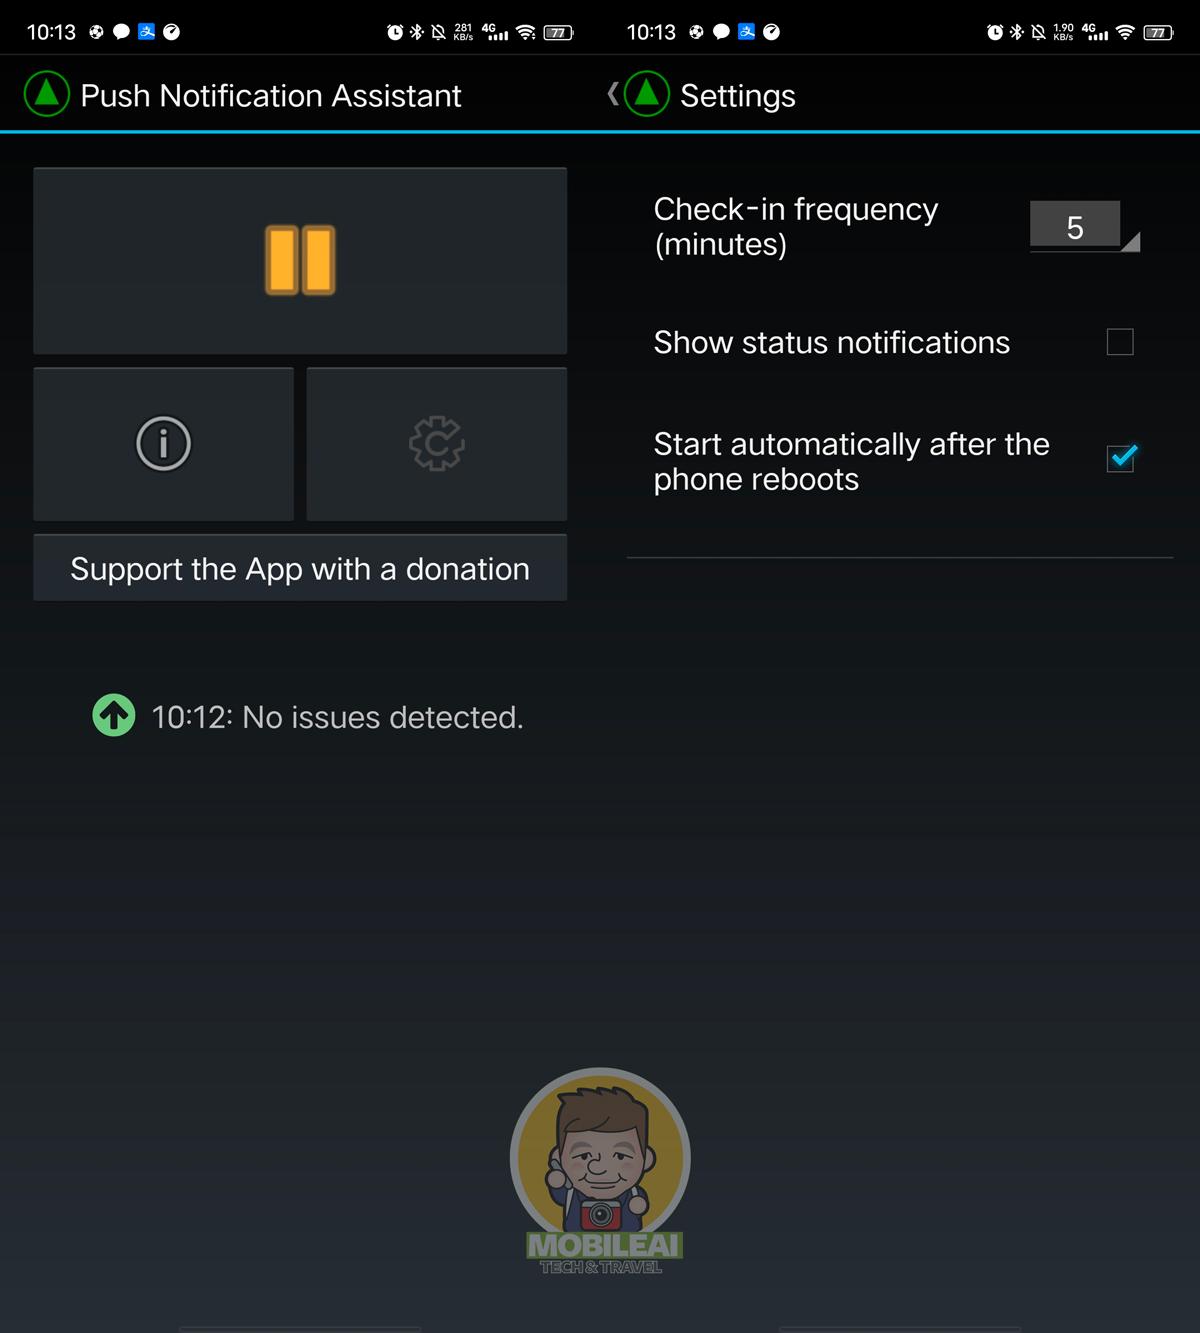 Push Notification Assistant 來解決陸版手機 LINE、Facebook、IG 不會跳通知的小工具